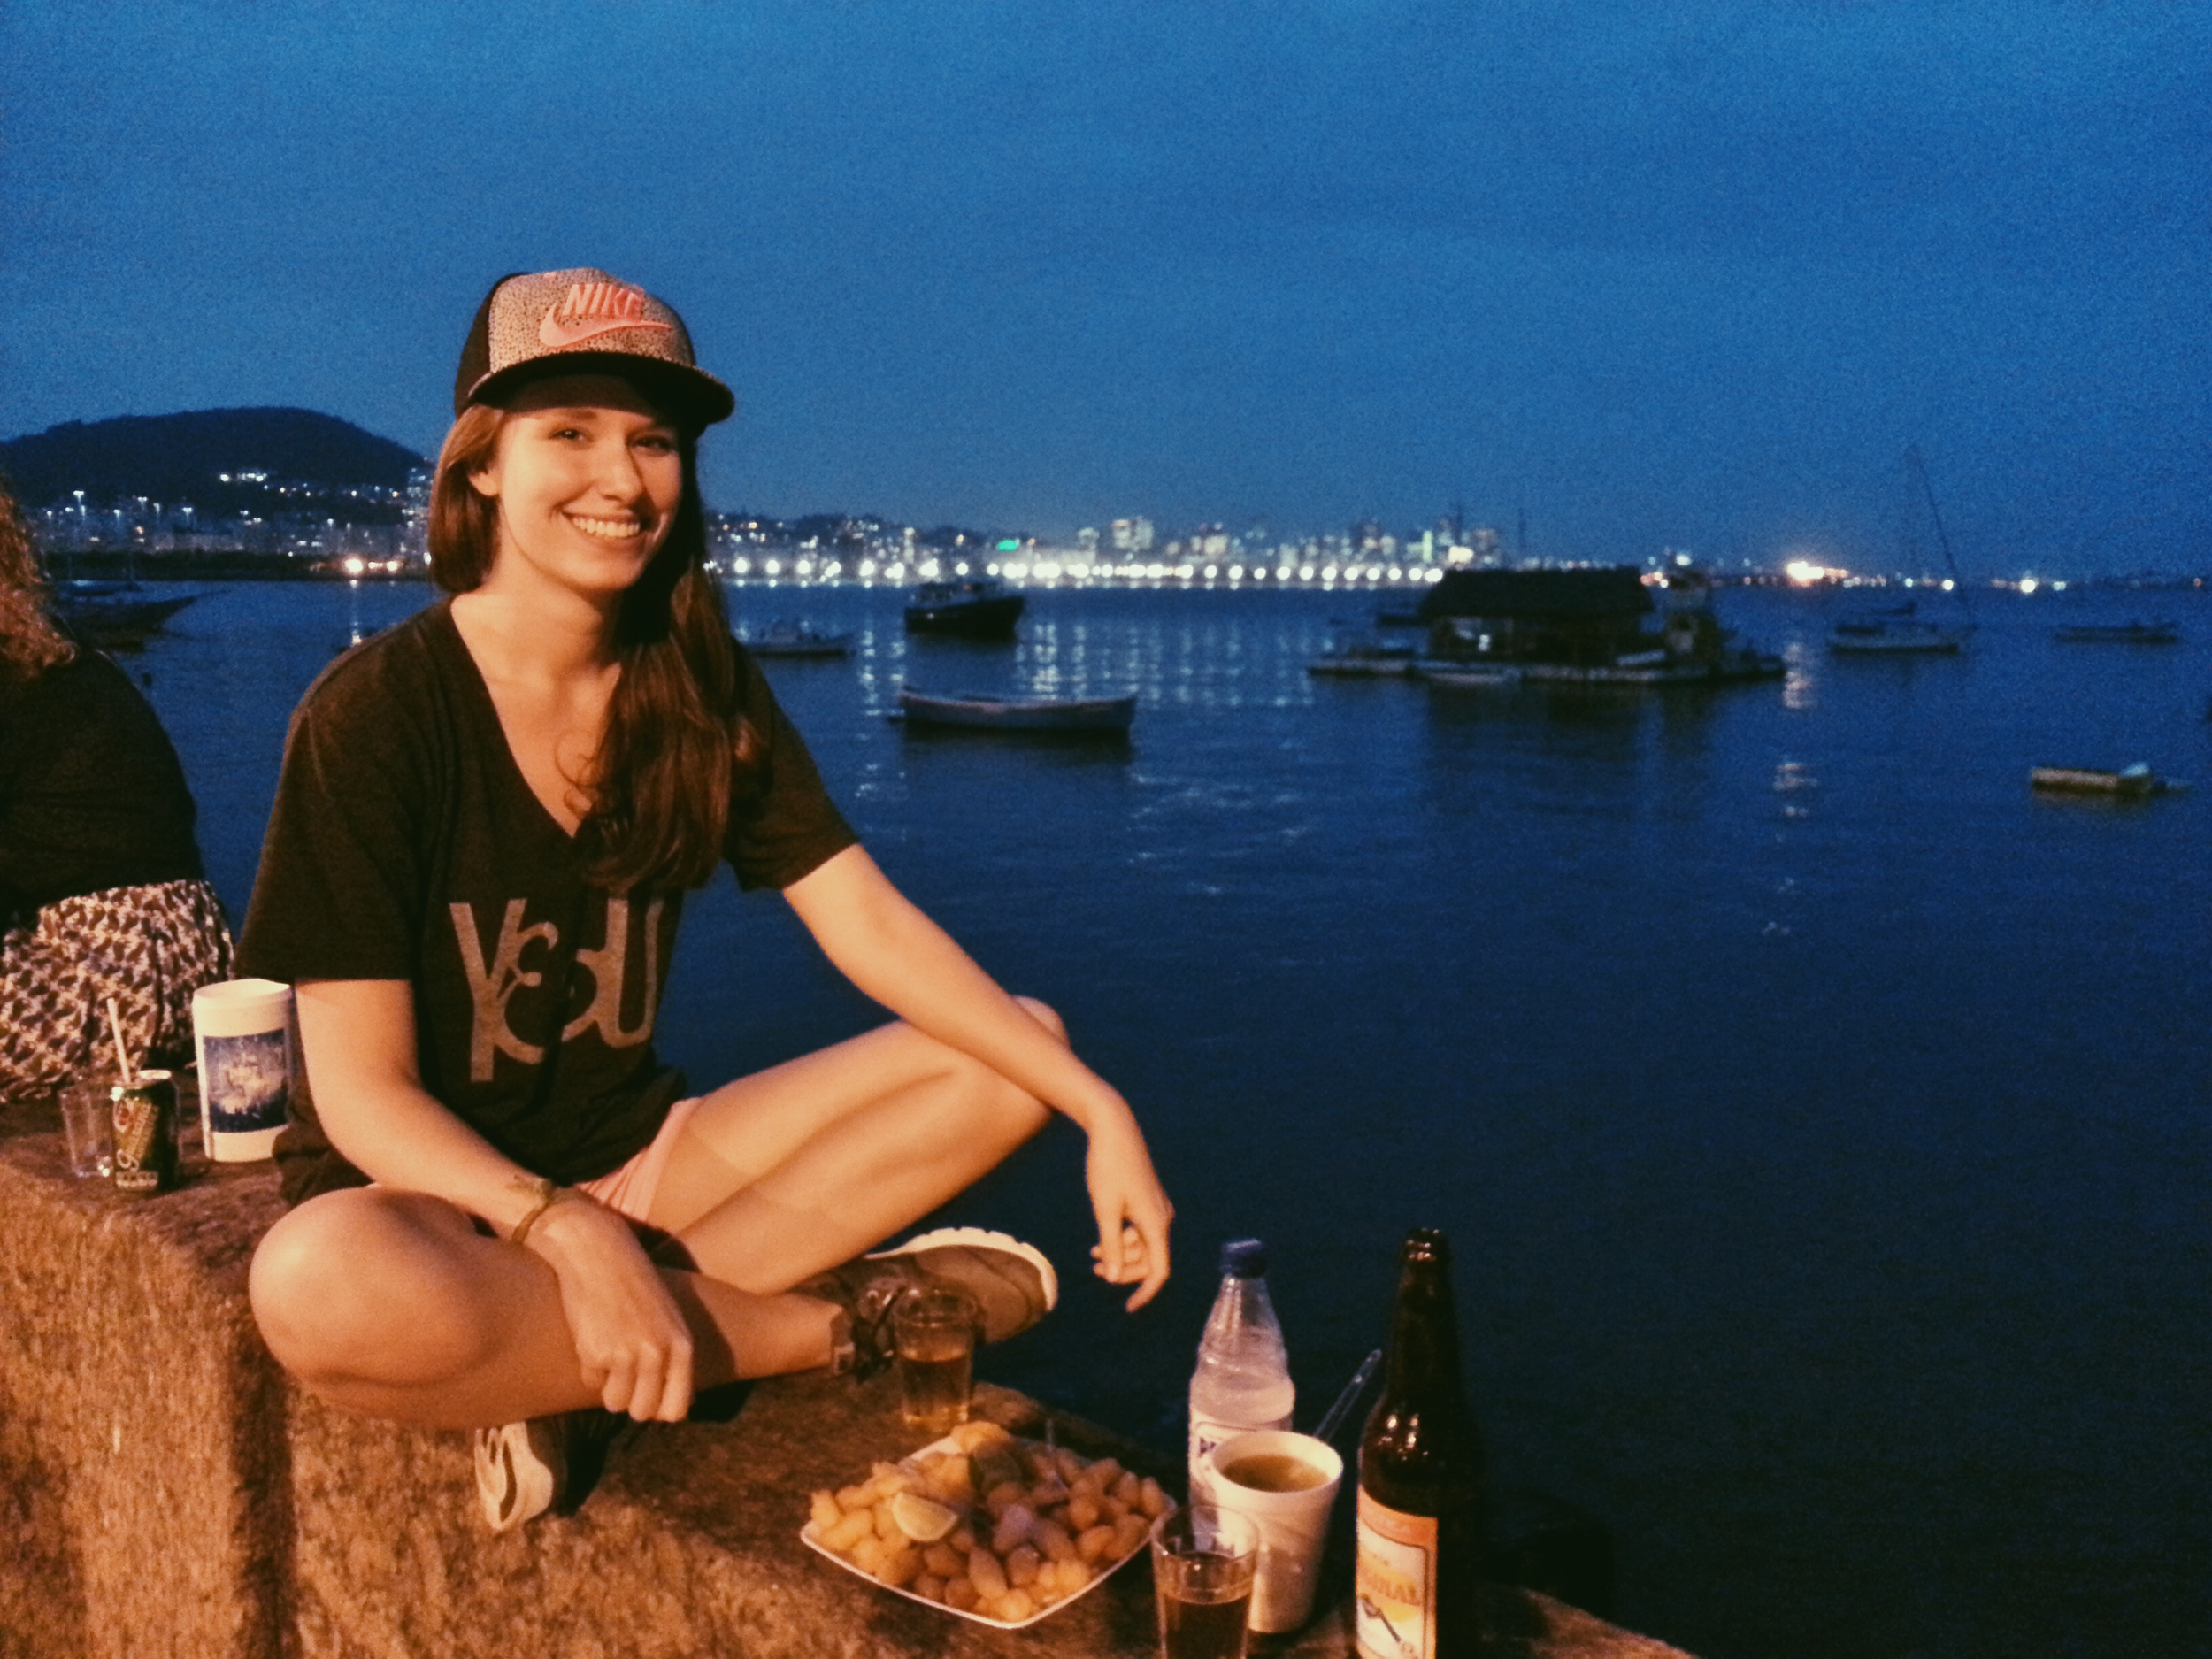 Brazil, Rio de Janeiro, Landscape, Travel photography, architecture, street photography, Bar Urca